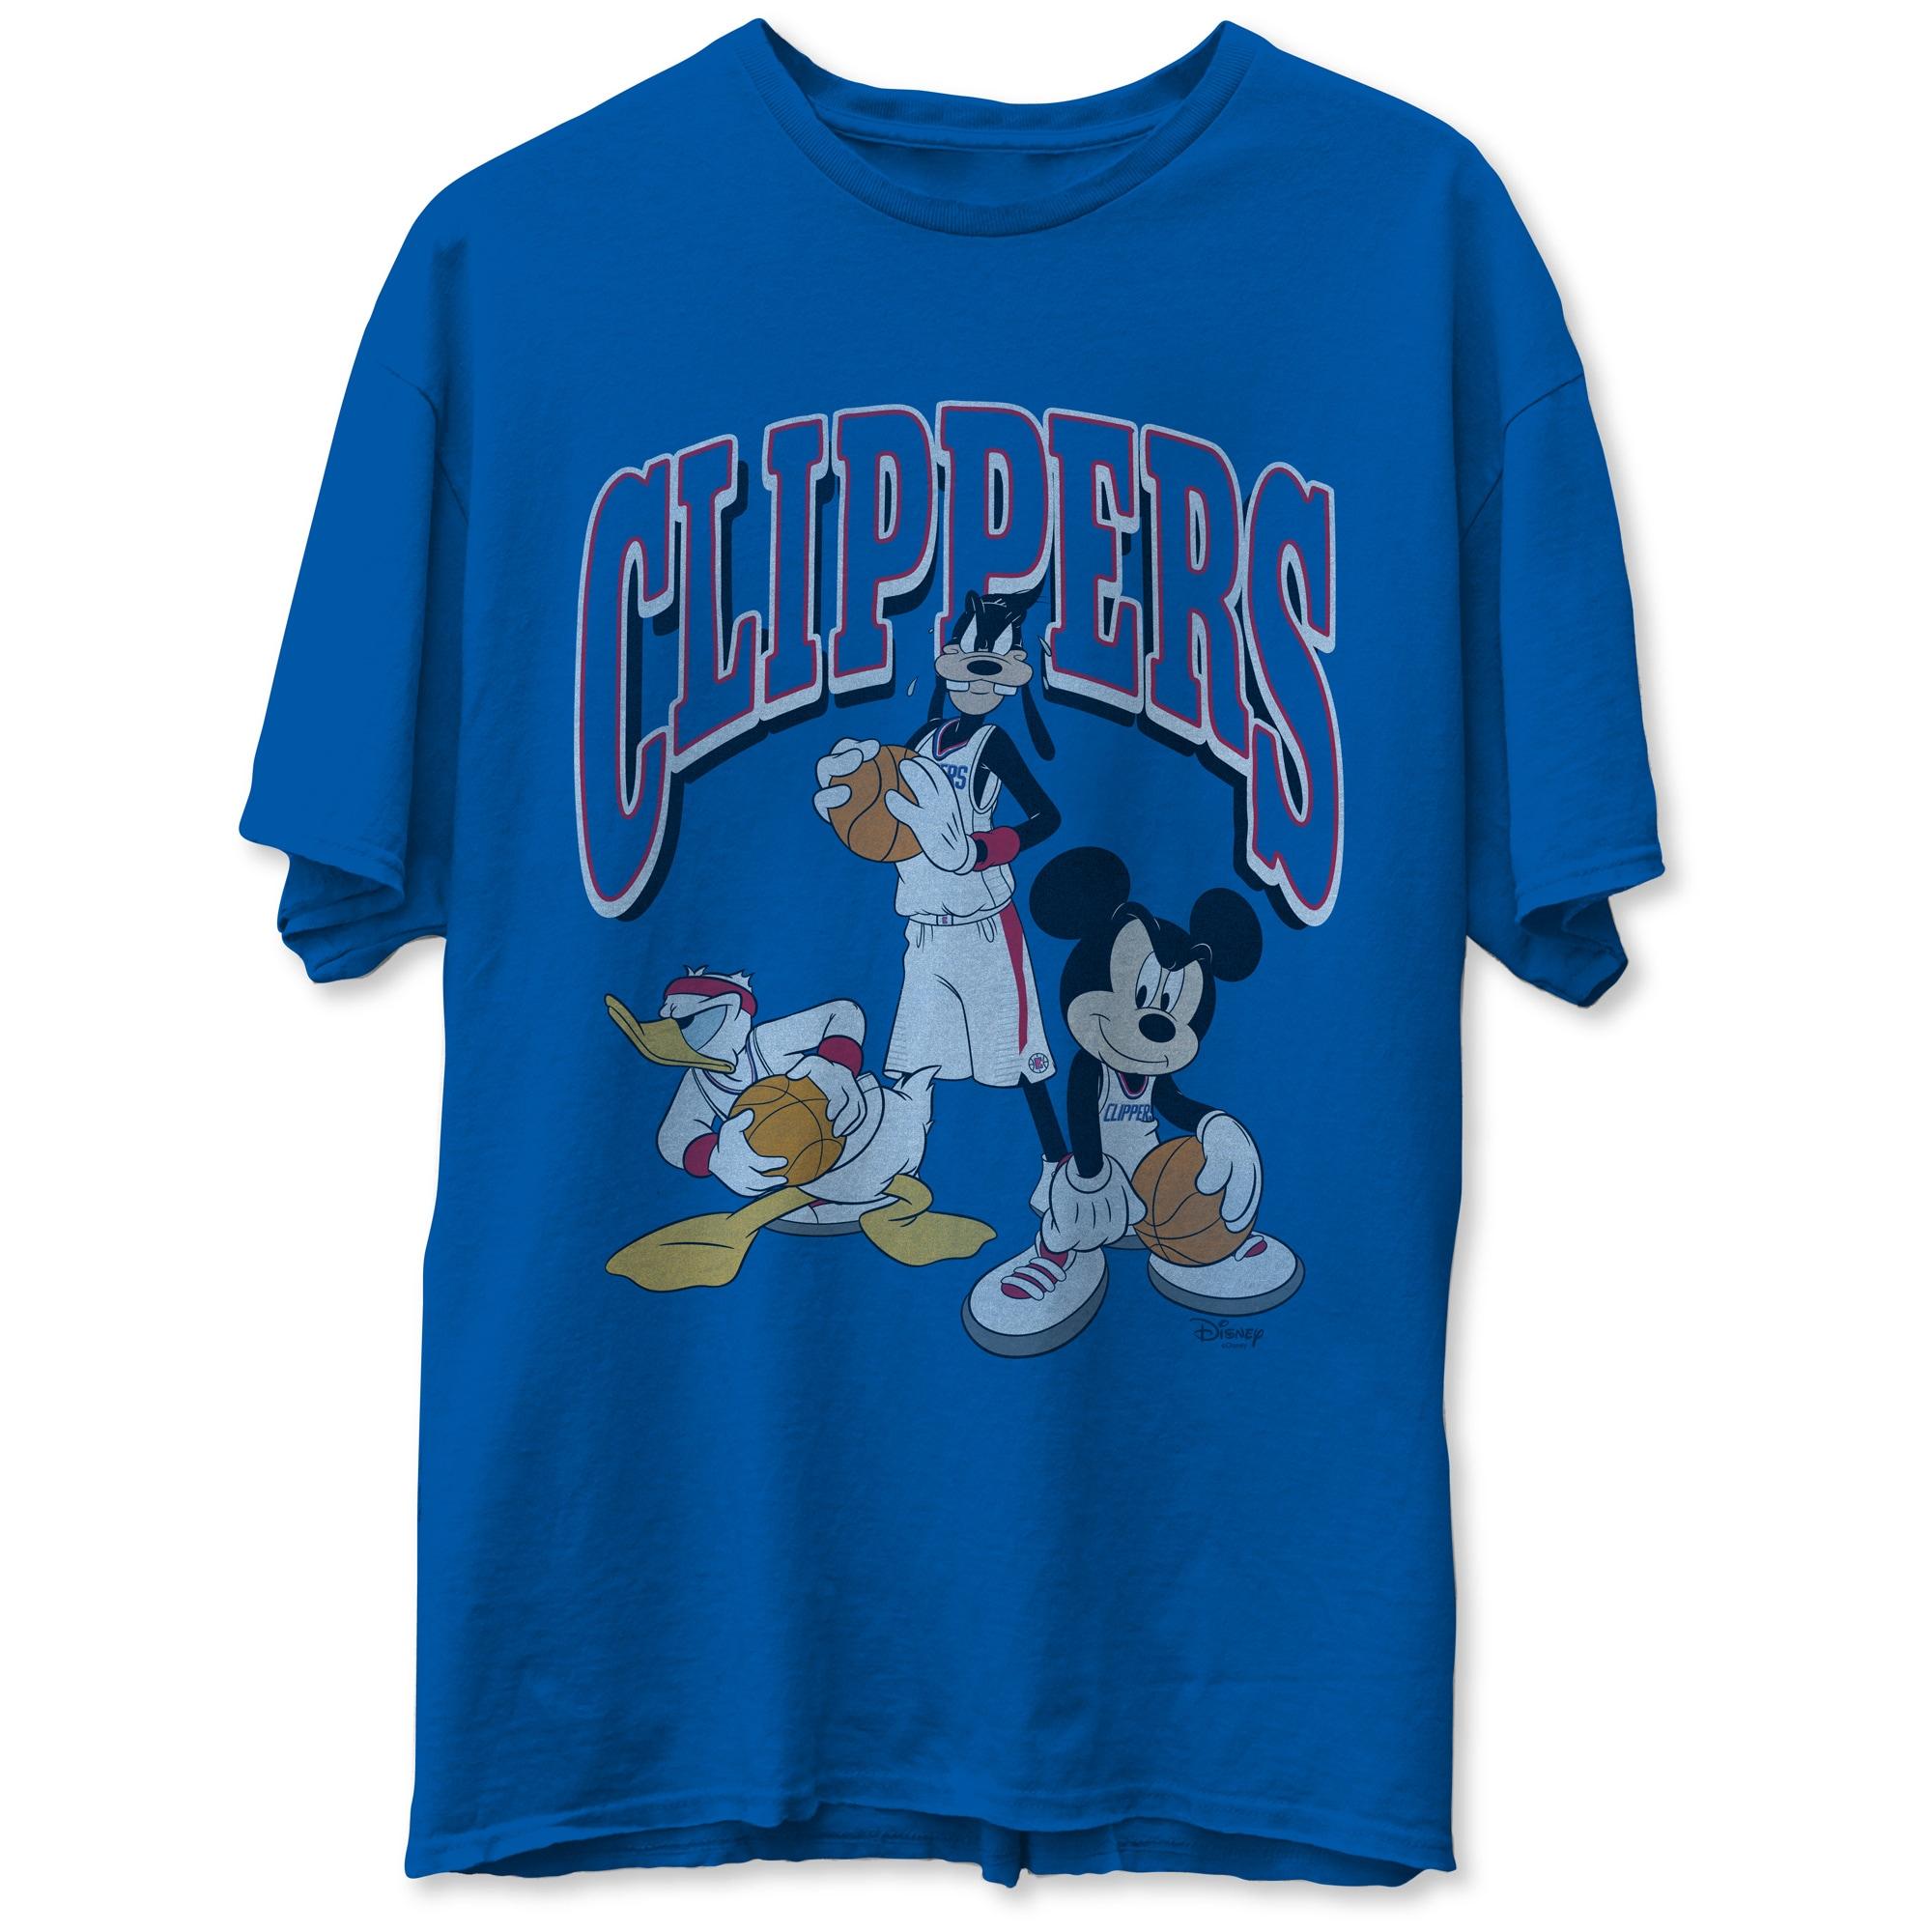 LA Clippers Junk Food Disney Mickey Squad T-Shirt - Royal